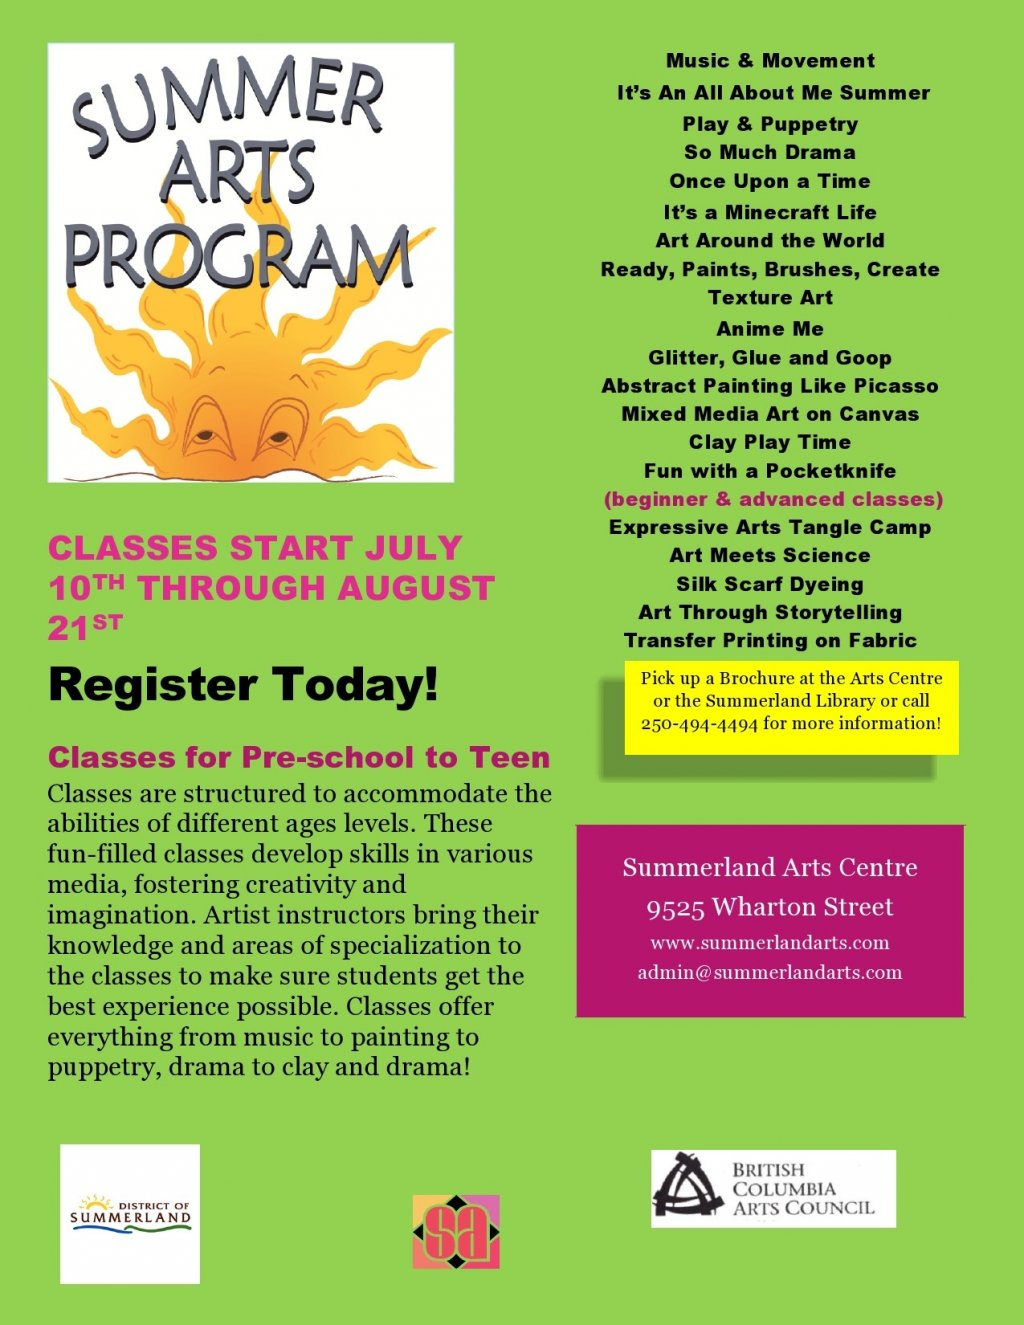 Summer Arts Program for Kids in Penticton, BC 【 Skaha ca 】